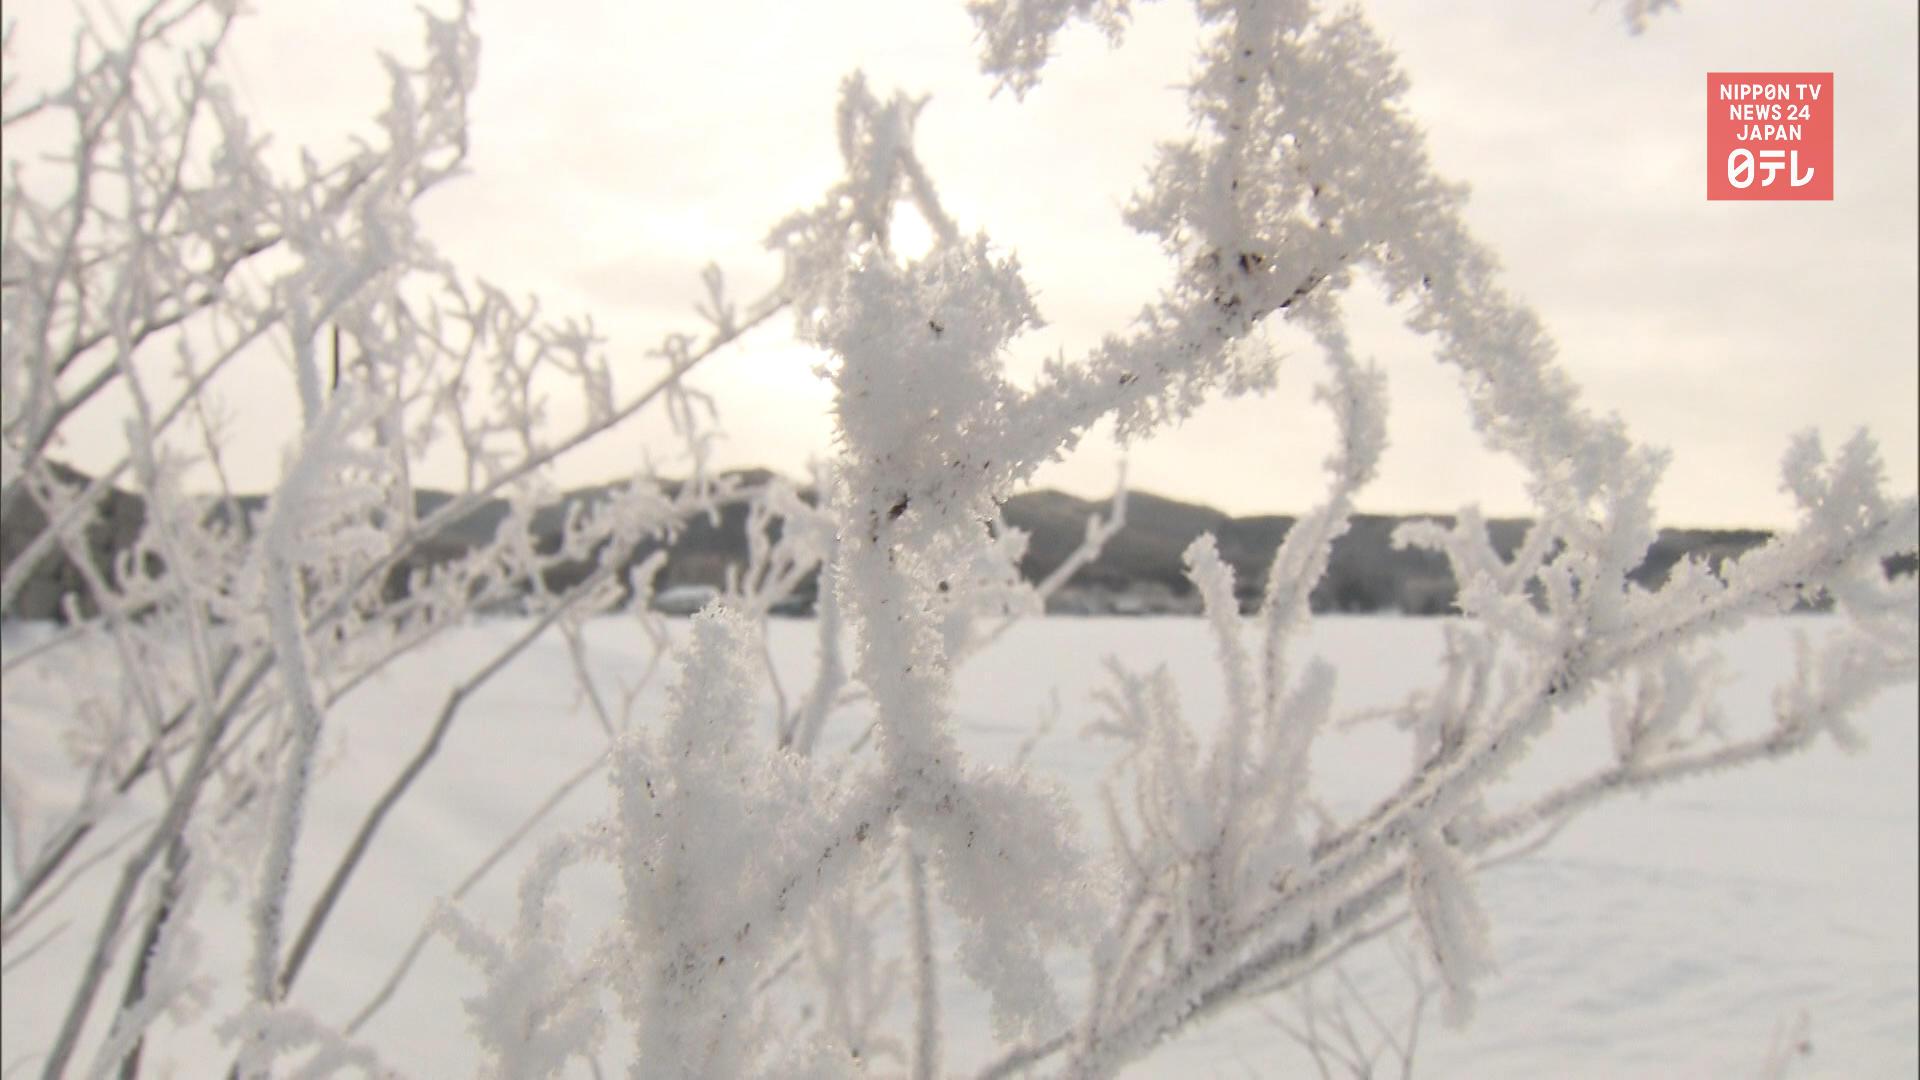 -25°C temps in Hokkaido